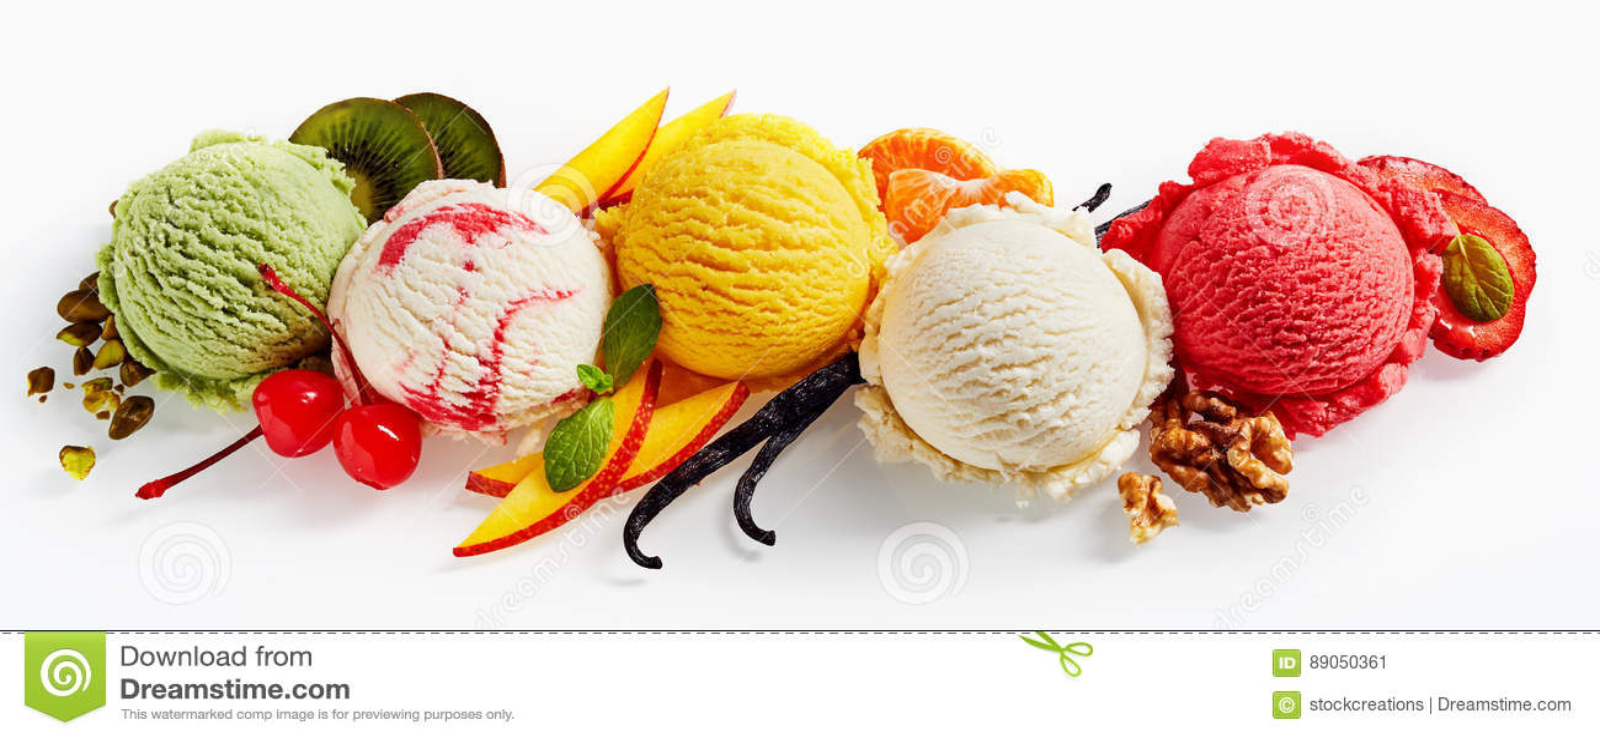 Row Of Ice Cream Scoops Stock Image Image Of Ice